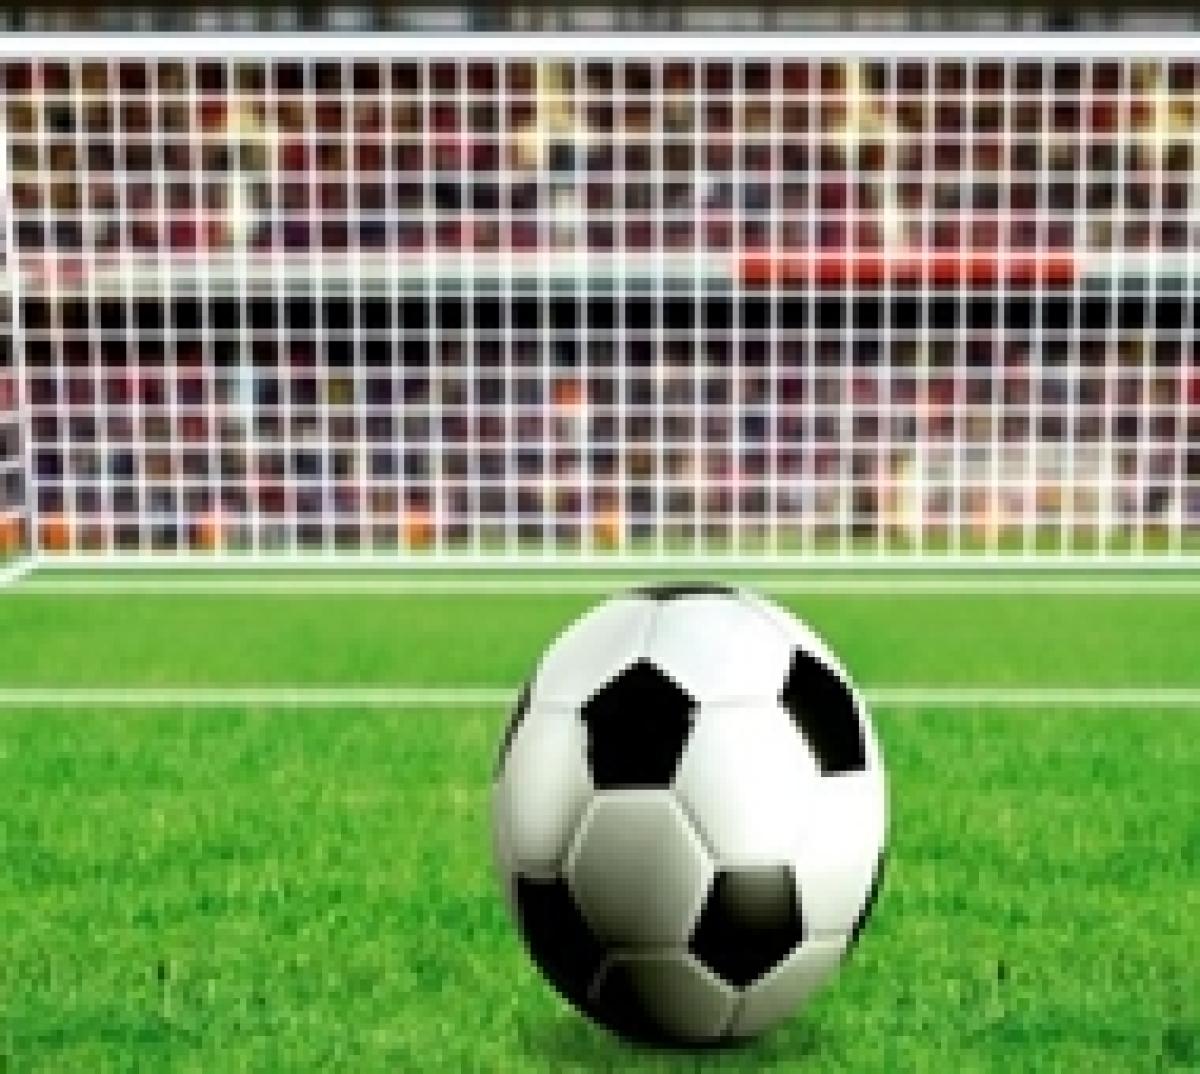 Indian footballers to train in EPL academies